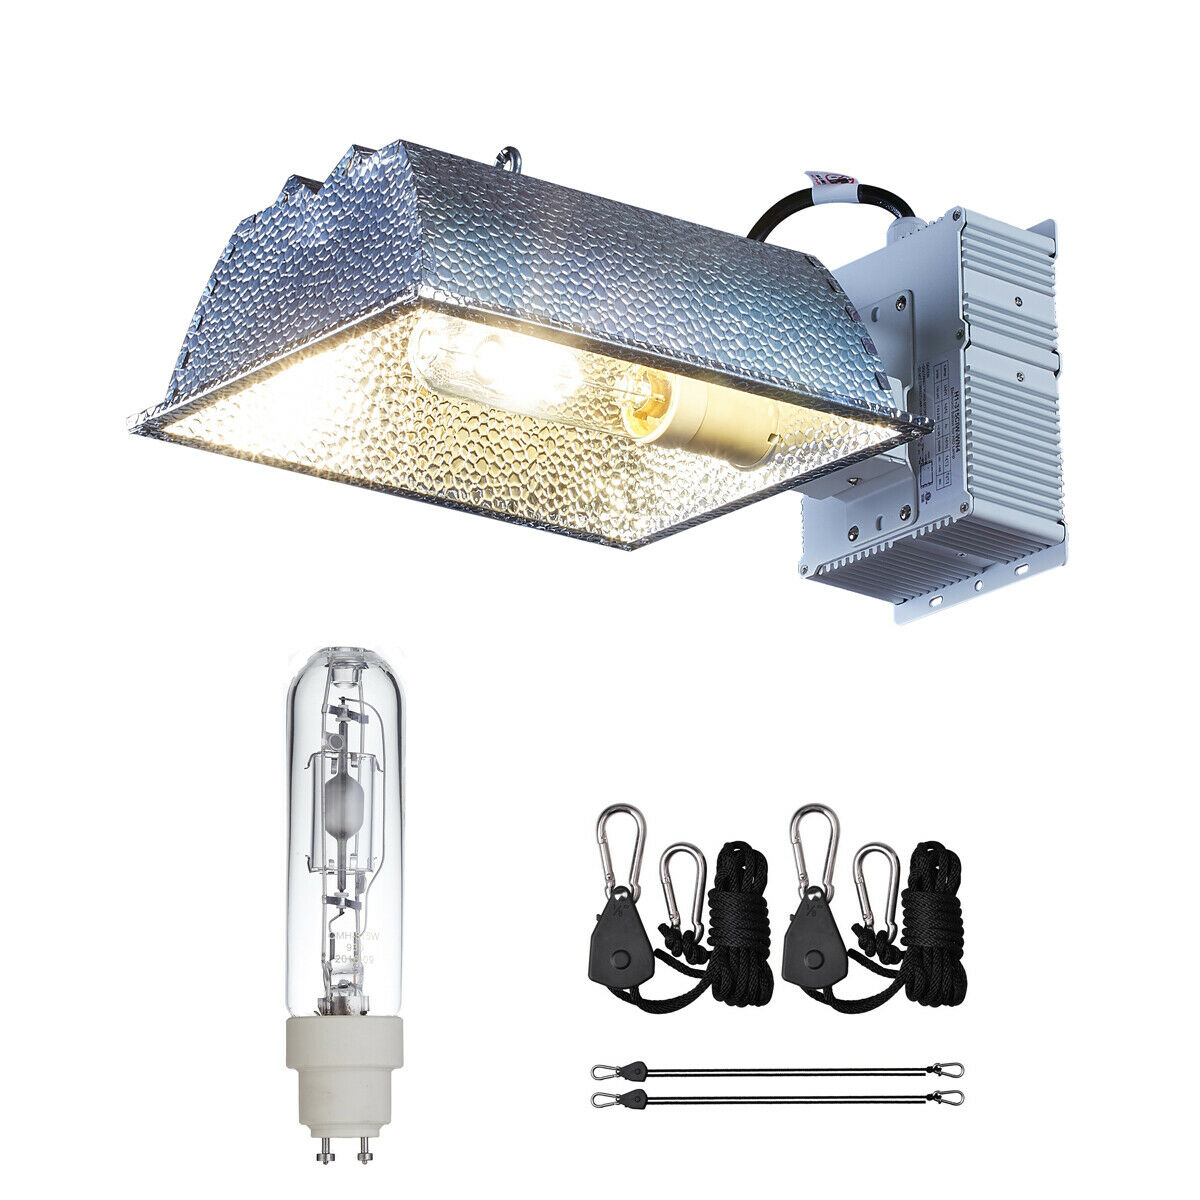 TopoLite CMH 315W Grow Light Kit Enclosed Reflector Fixture